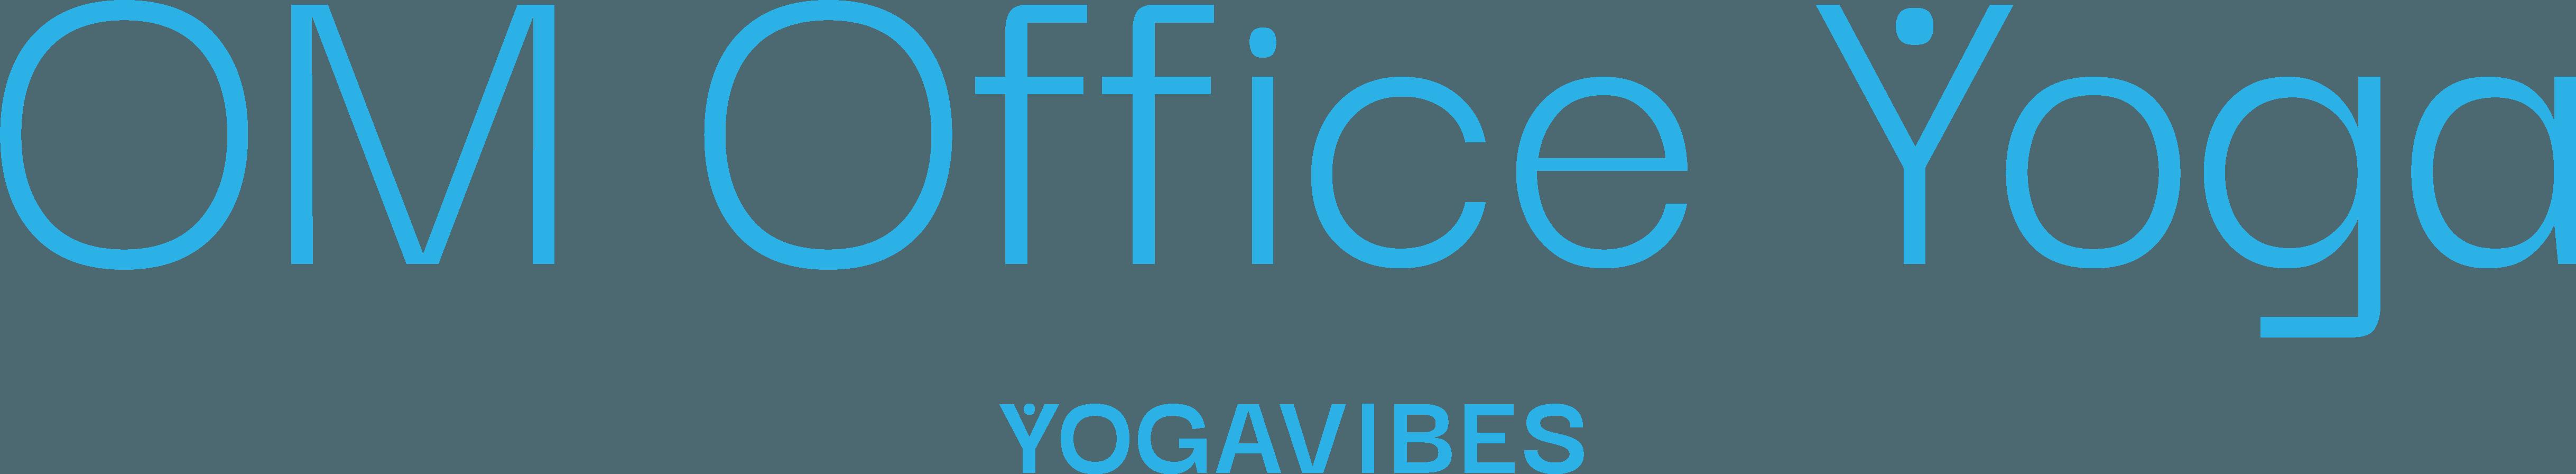 OM Office Yoga by YogaVibes